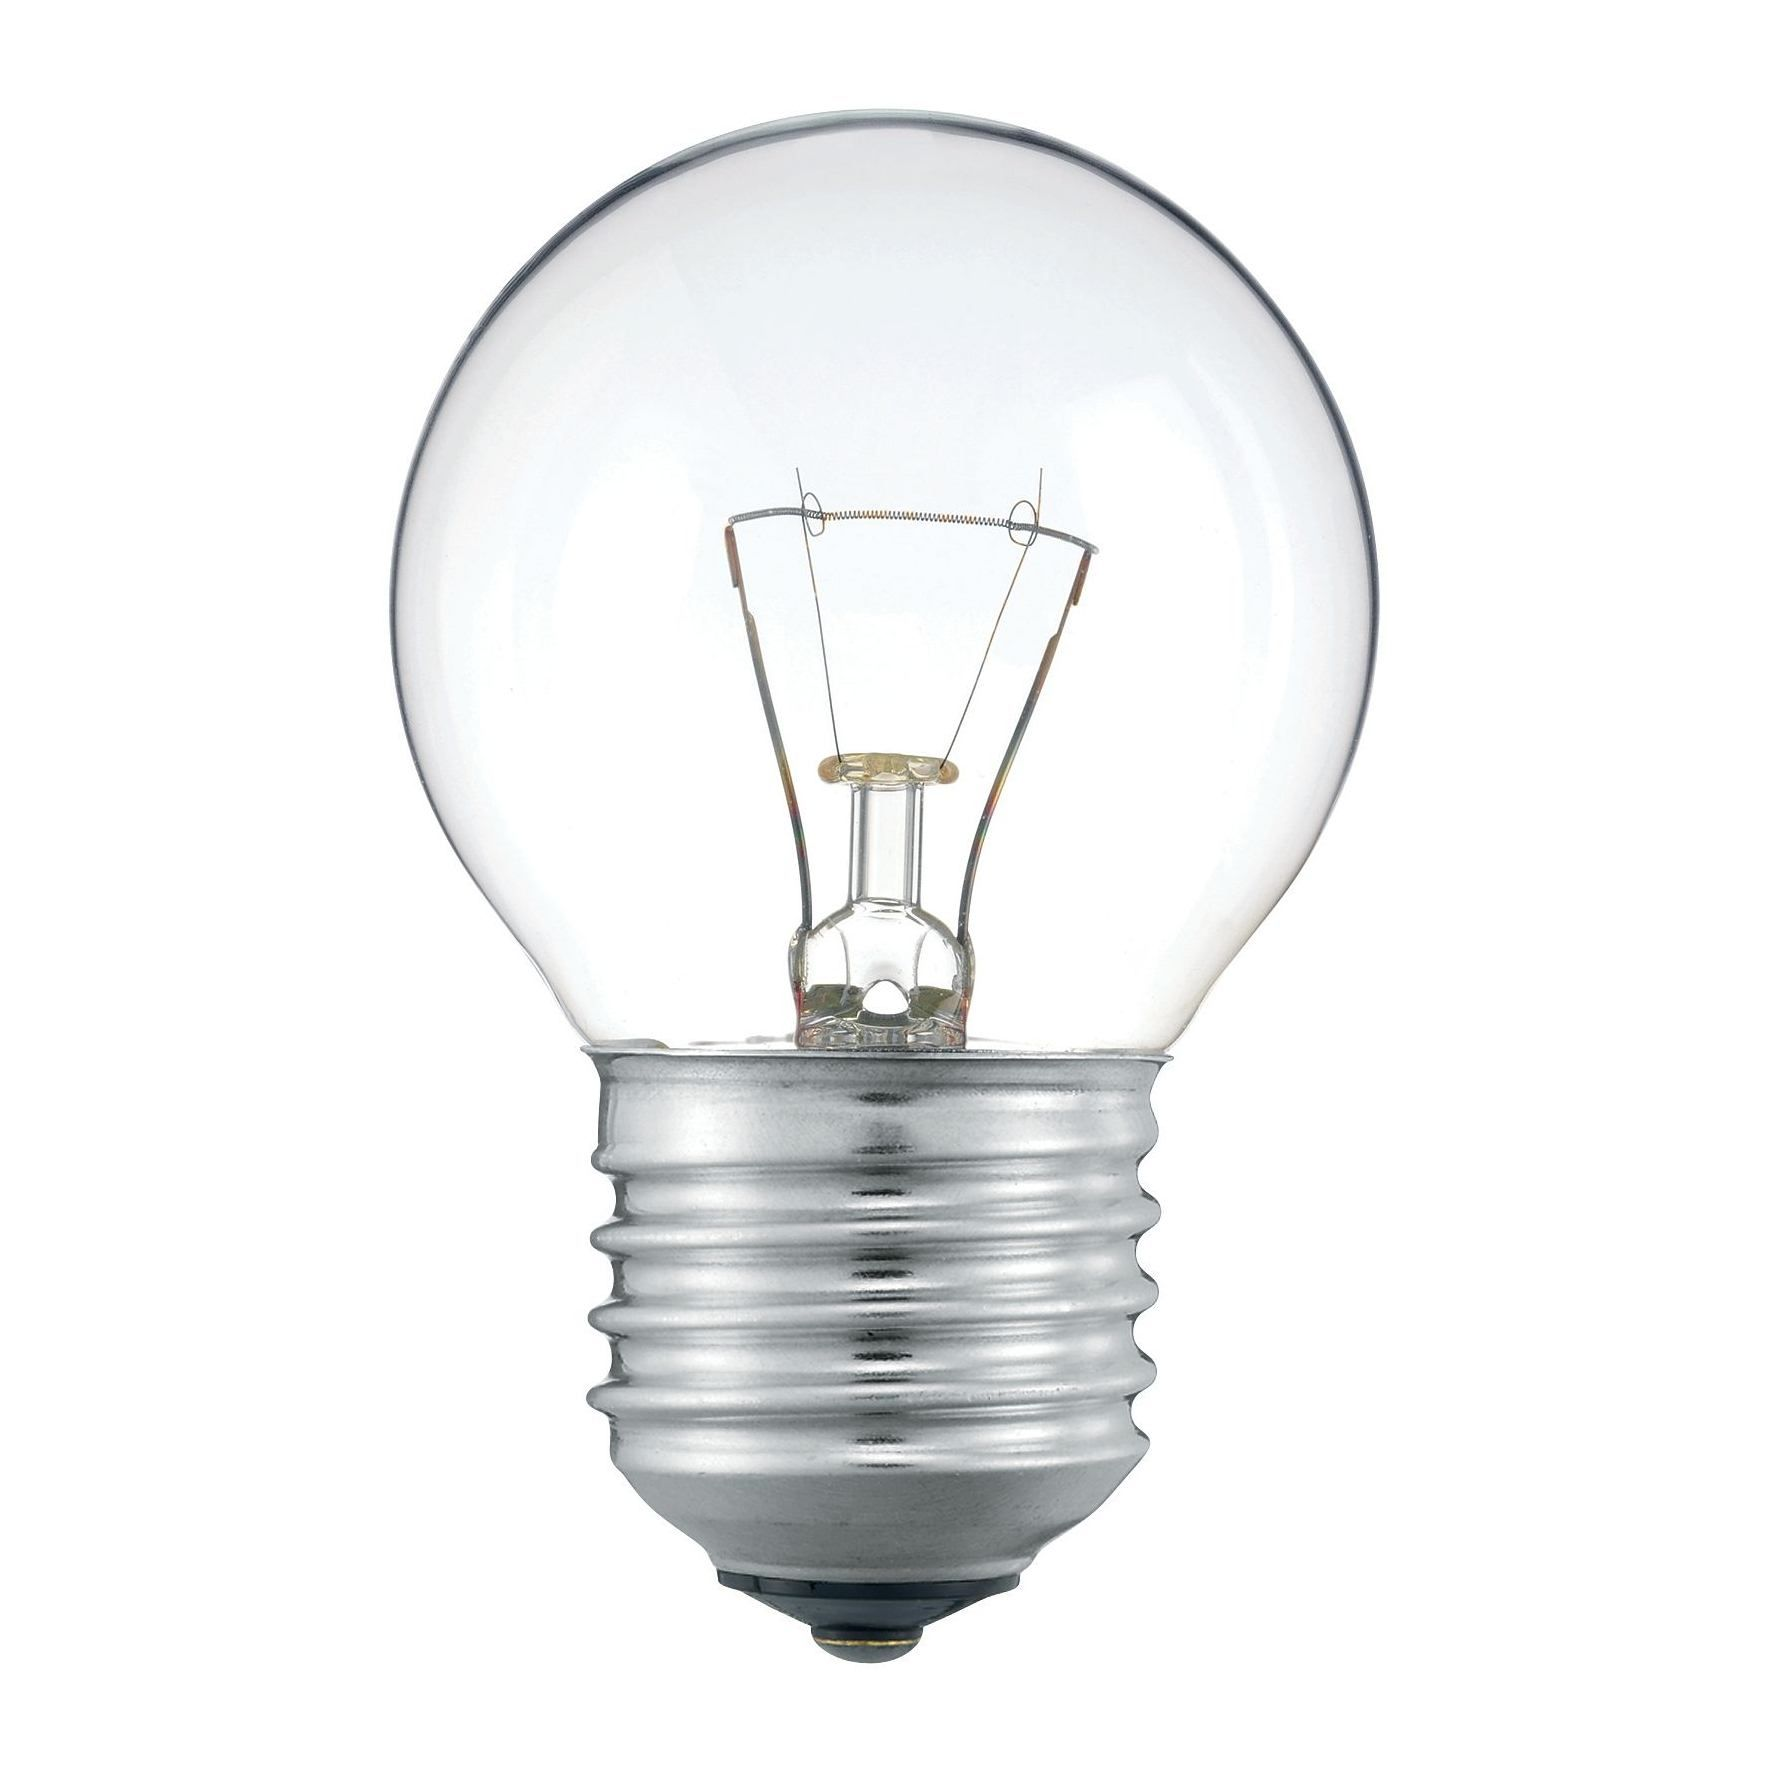 Лампа накаливания Philips P45 60W 230V E27 CL.1CT/10X10F прозрачная  - Купить